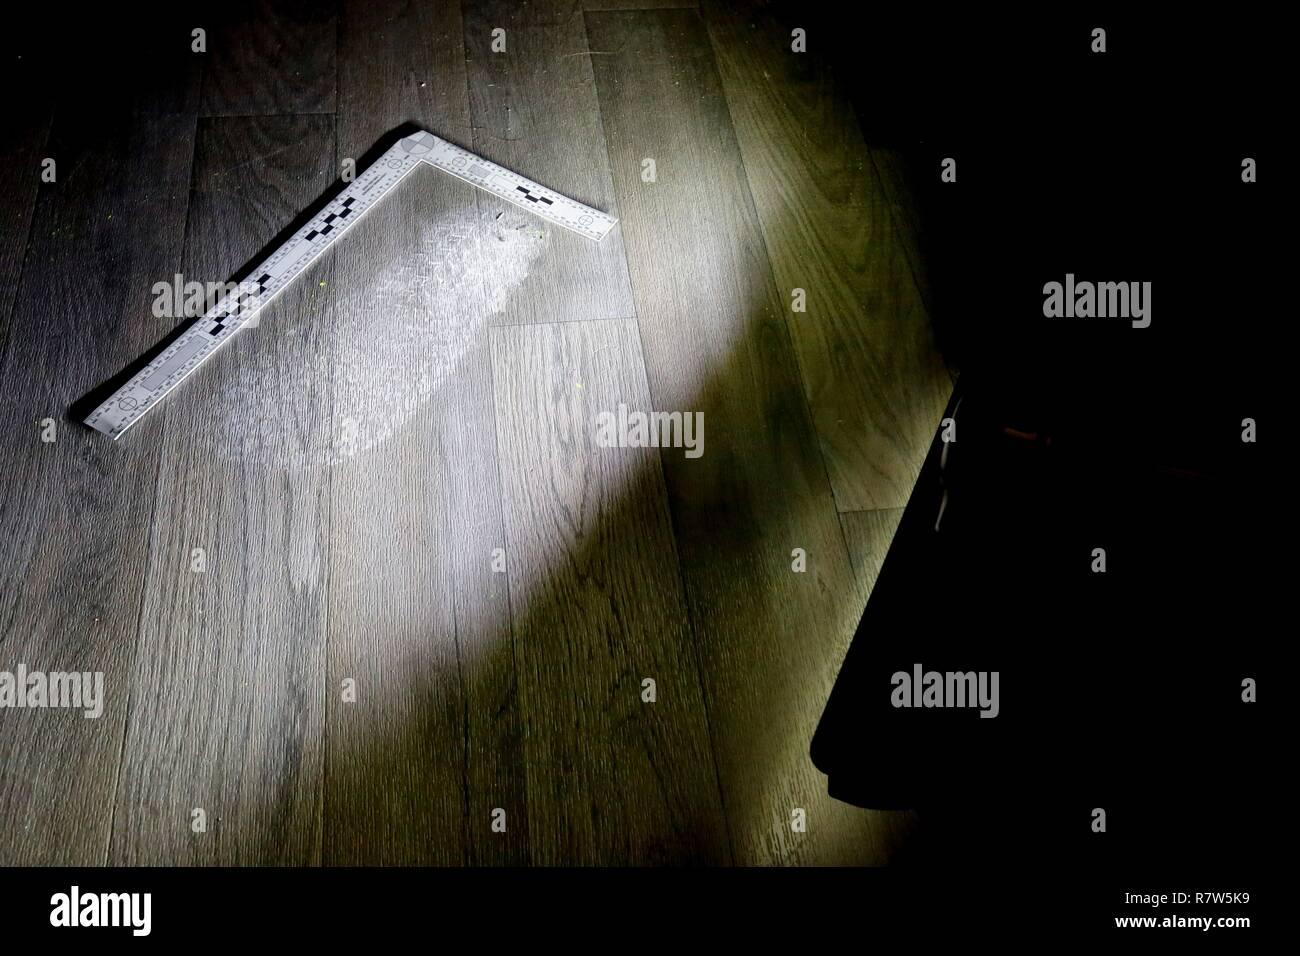 France, Val d'Oise, Pontoise, Criminal Investigation Institute of the National Gendarmerie, Forensic Division human fingerprint identification - Stock Image